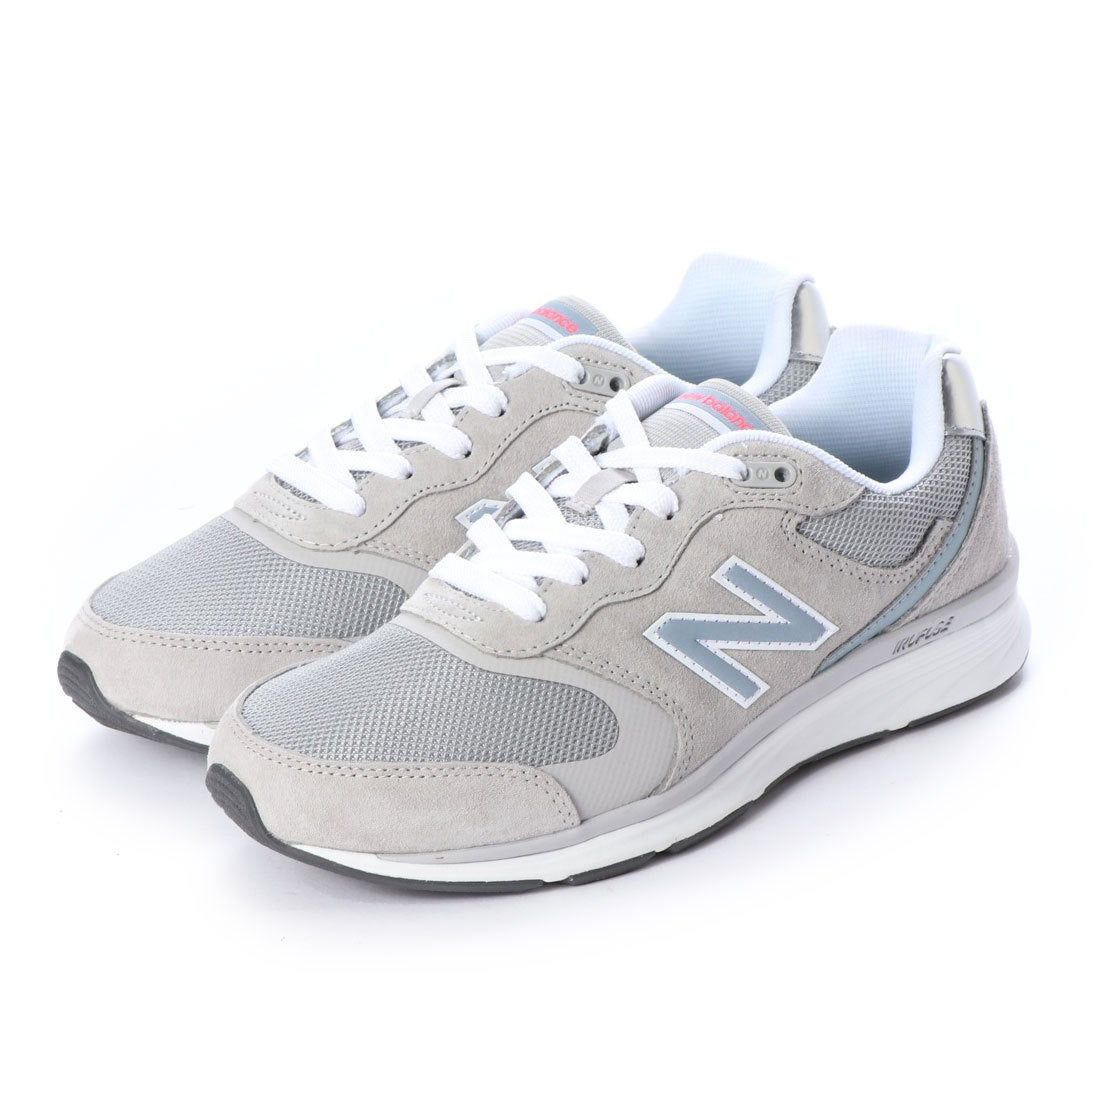 a8f5c7fcb6dcc ニューバランス new balance 【NB】SH WW880 高機能ウォーキングカジュアル (グレー) -靴&ファッション通販 ロコンド 〜自宅で試着、気軽に返品